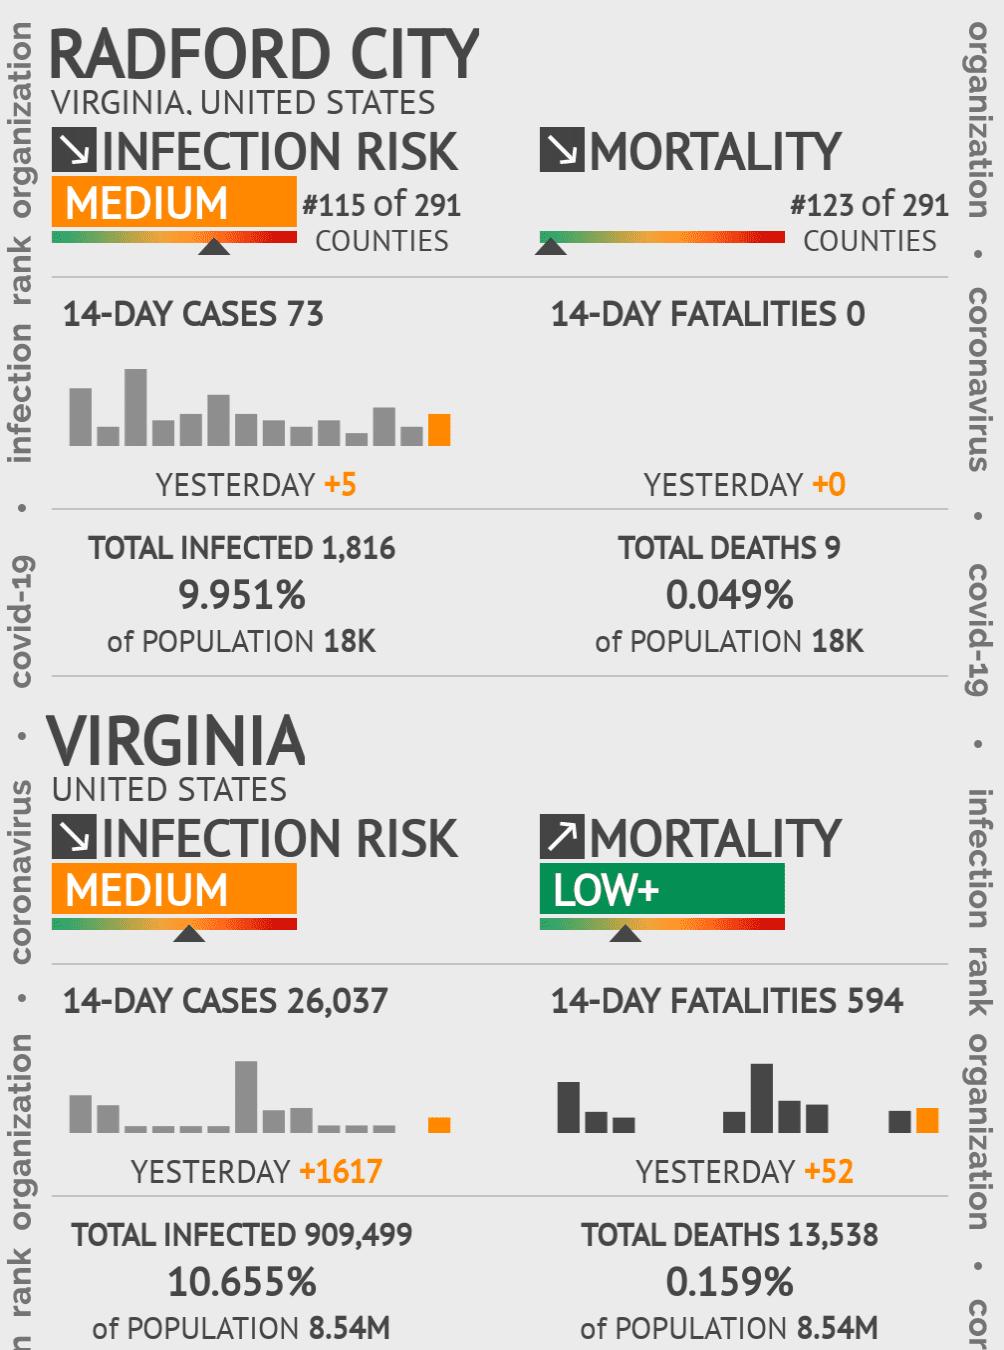 Radford City Coronavirus Covid-19 Risk of Infection on February 04, 2021